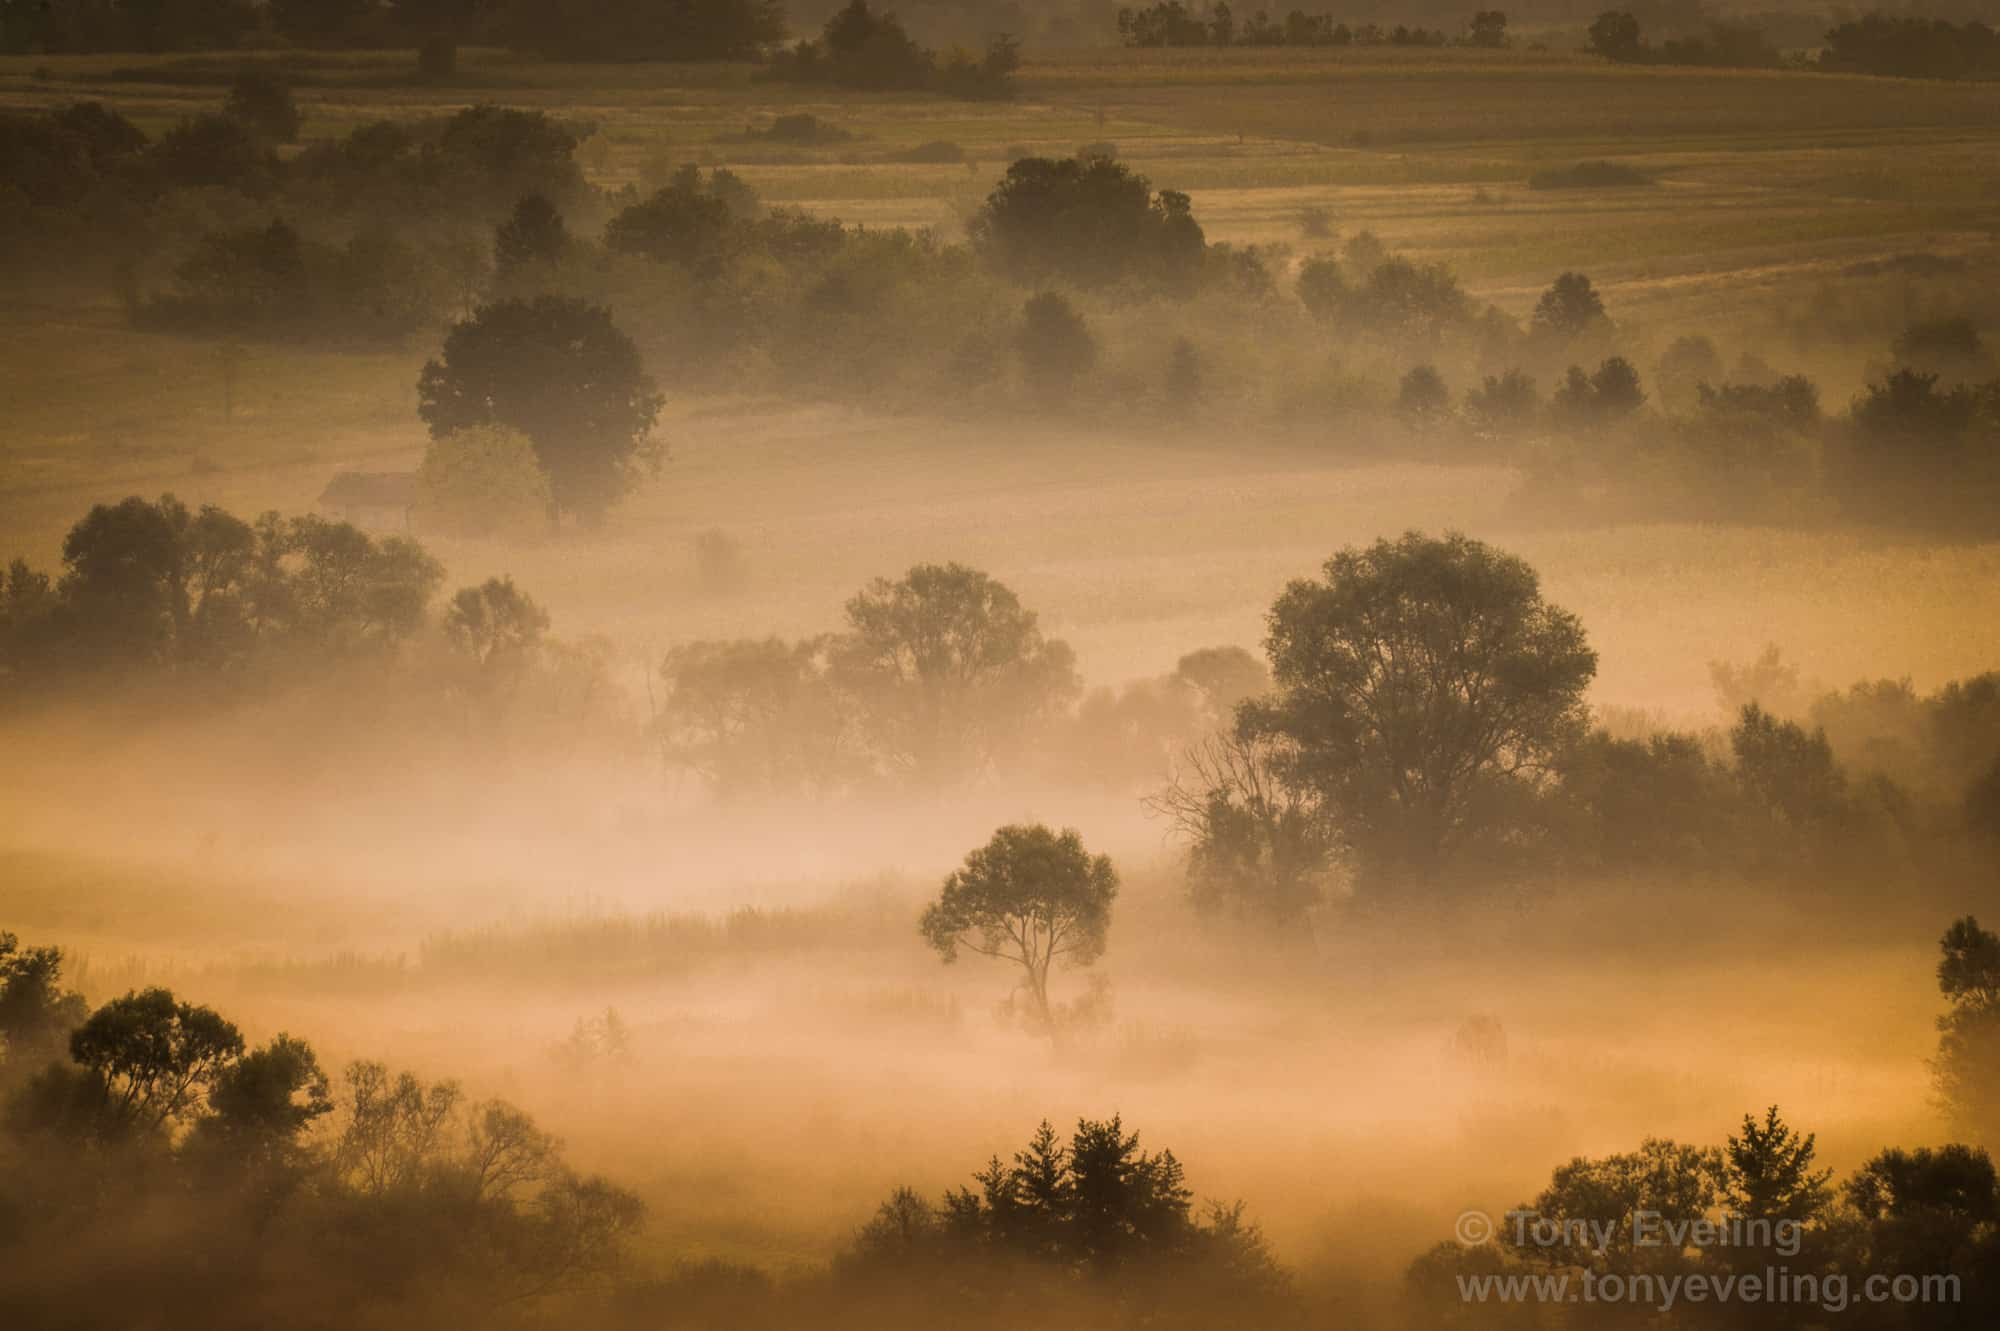 Misty morning at dawn.  Wallachia Province, romania